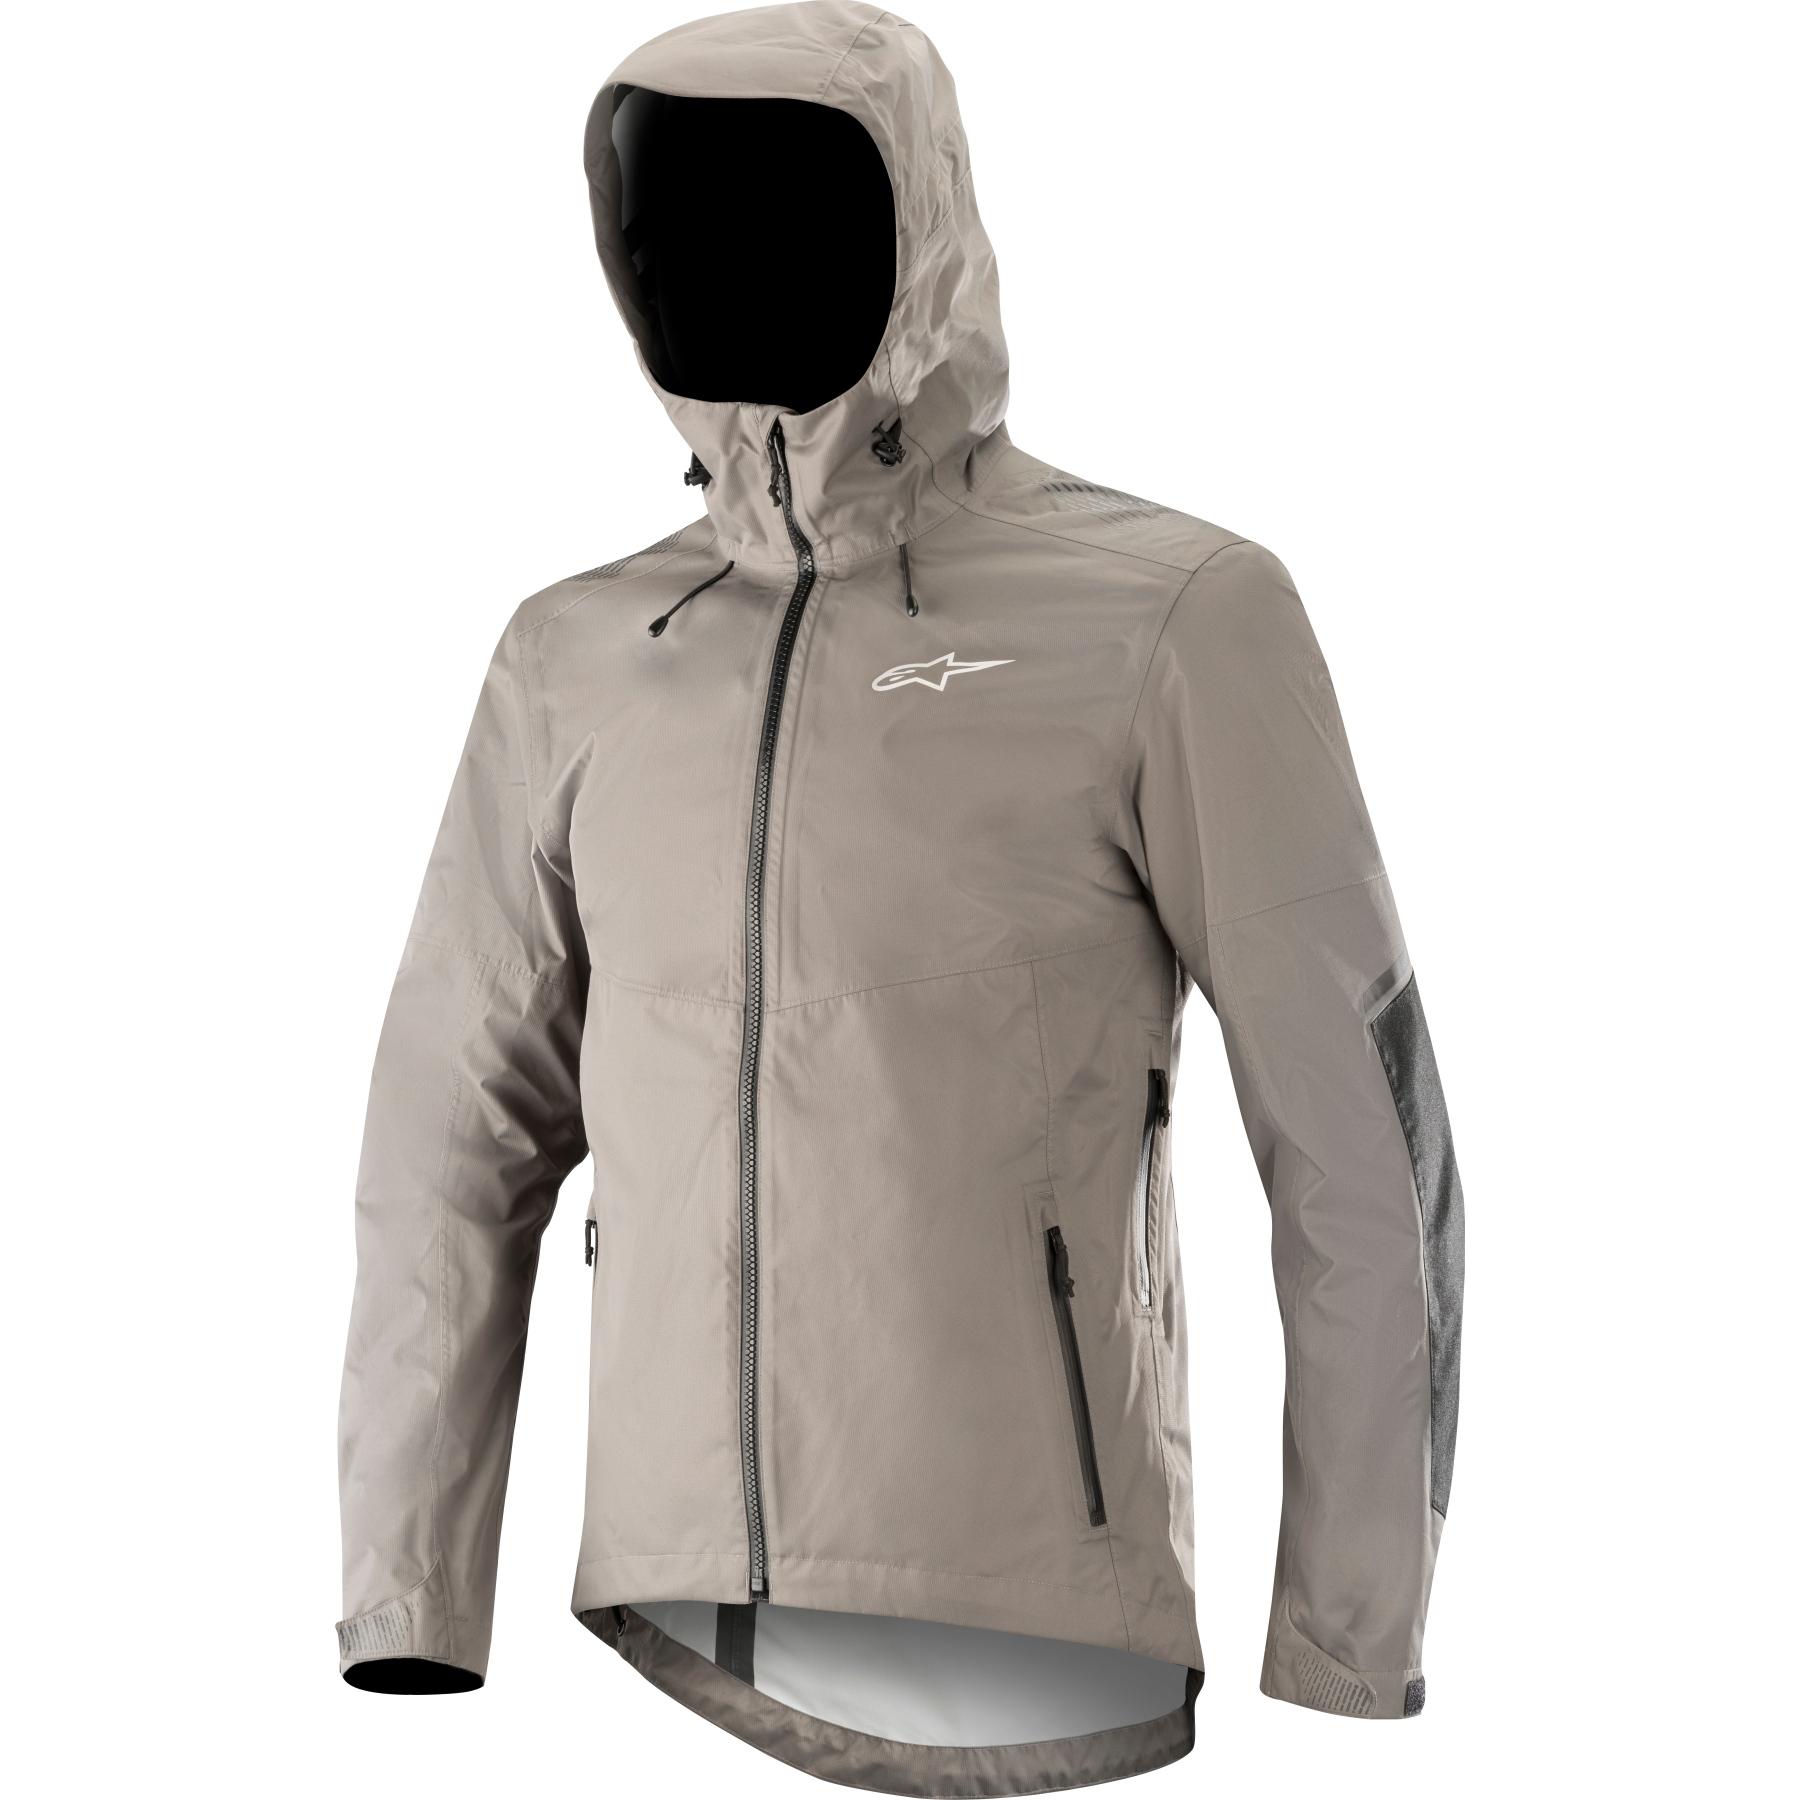 Alpinestars Tahoe Waterproof Jacket - charcoal white